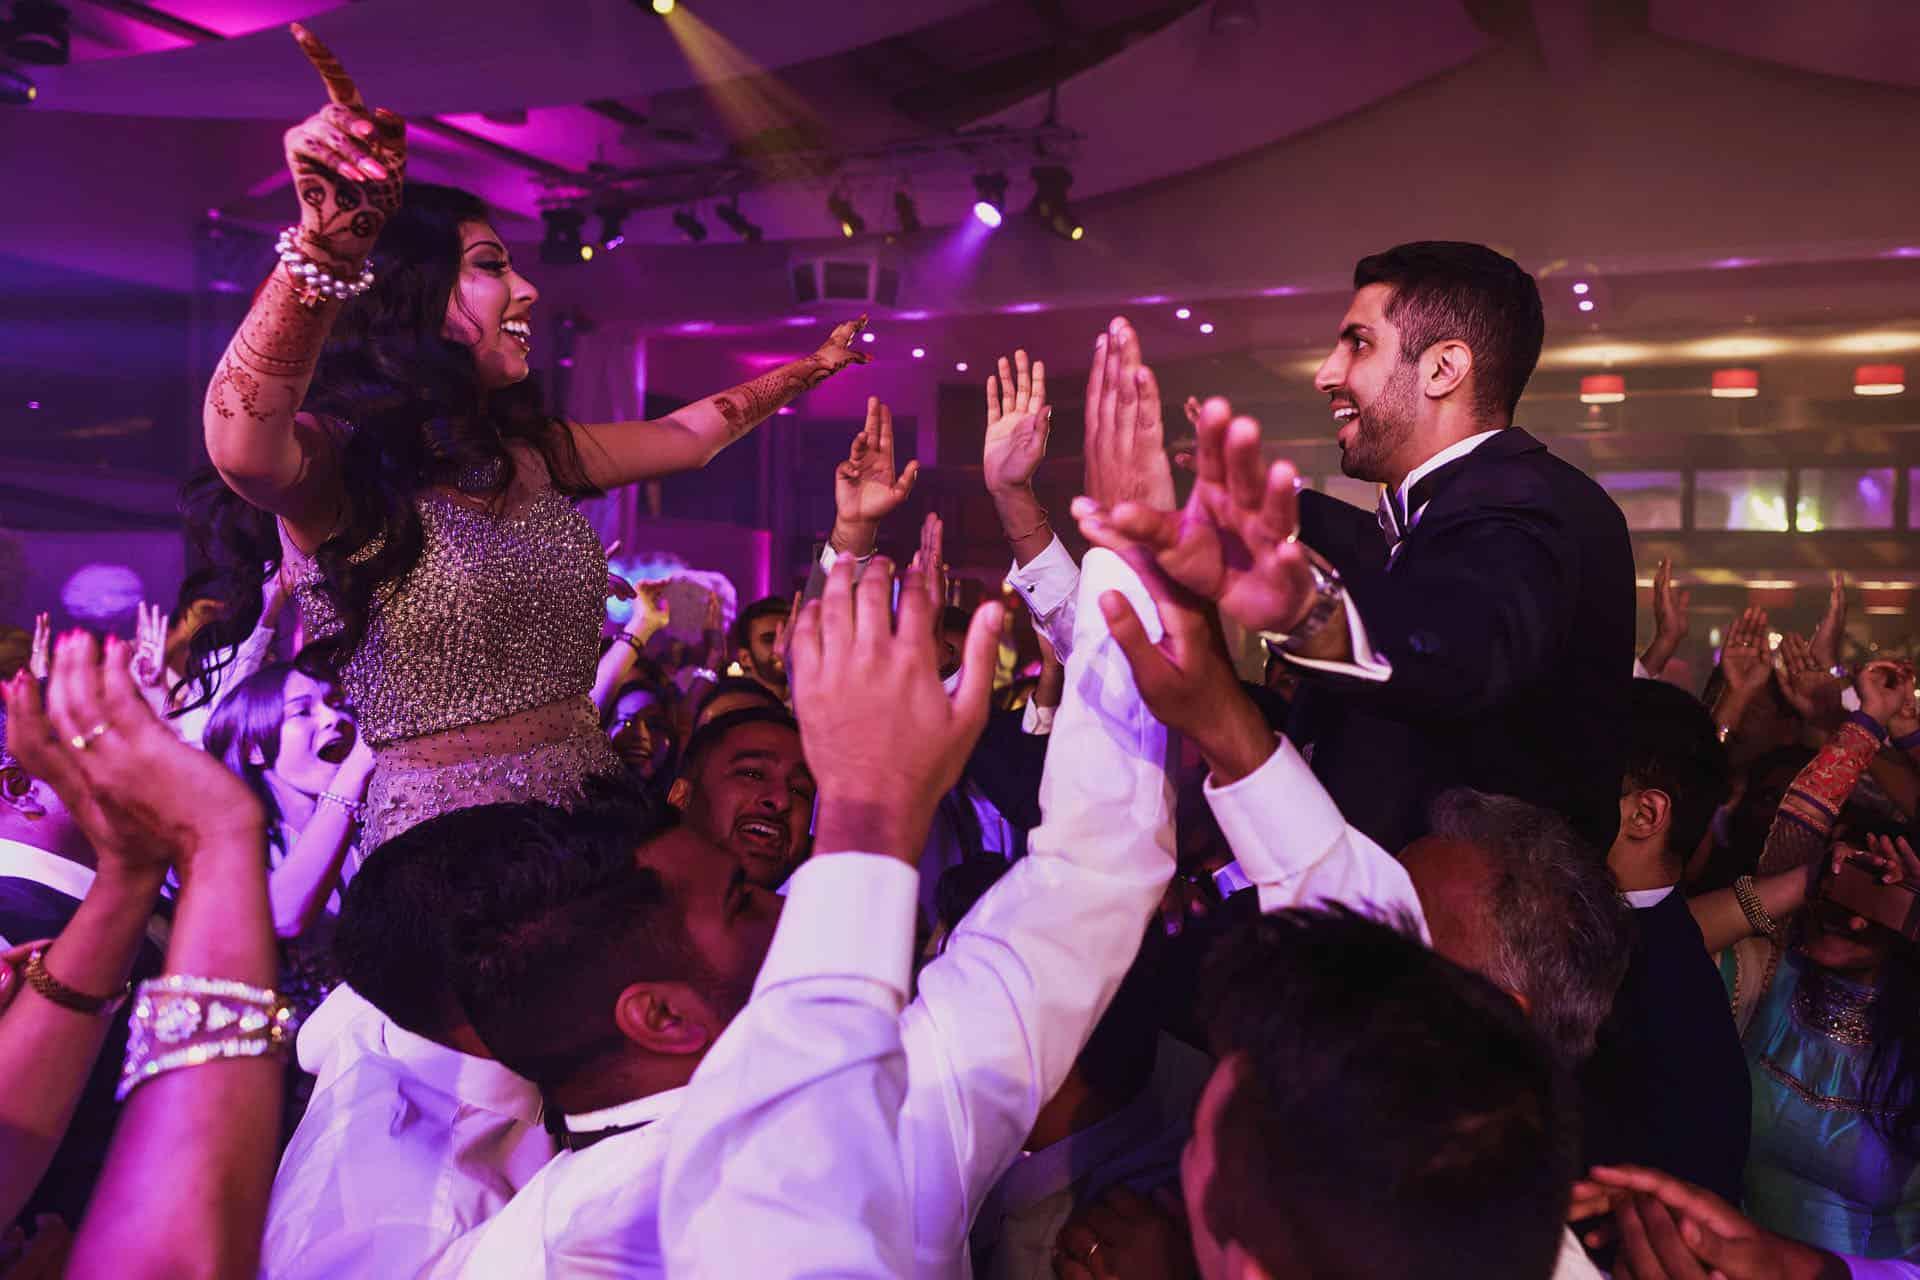 dallas burston indian wedding photography